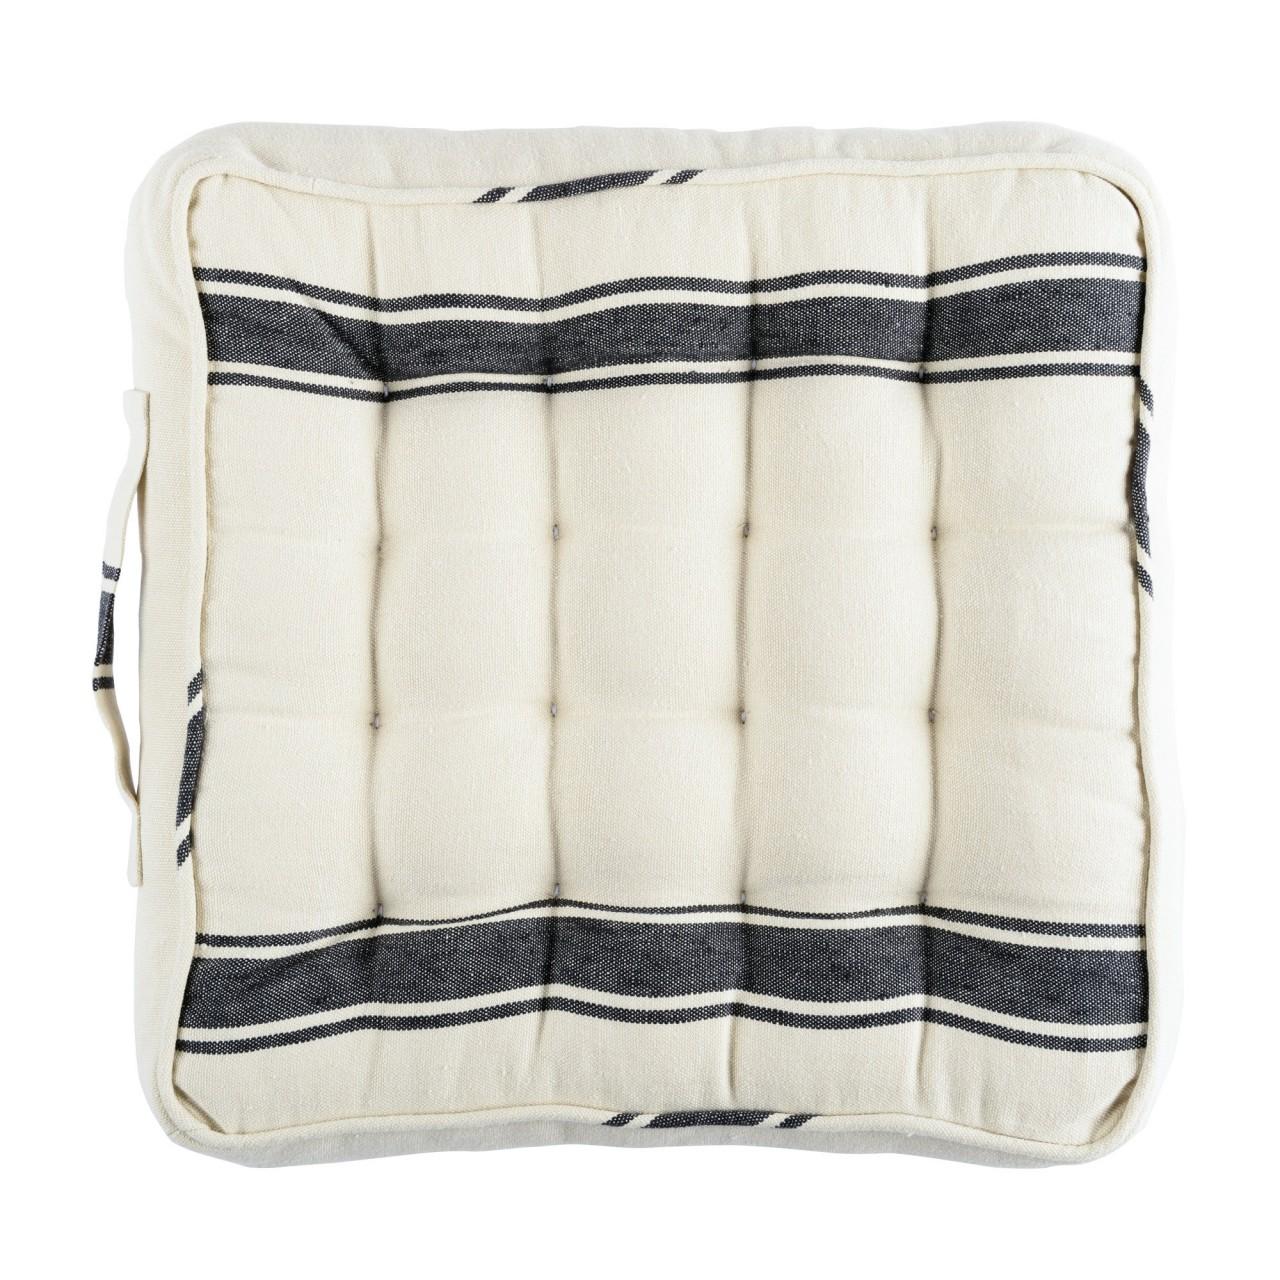 HAJDU STRIPE Linen Chair Cushion